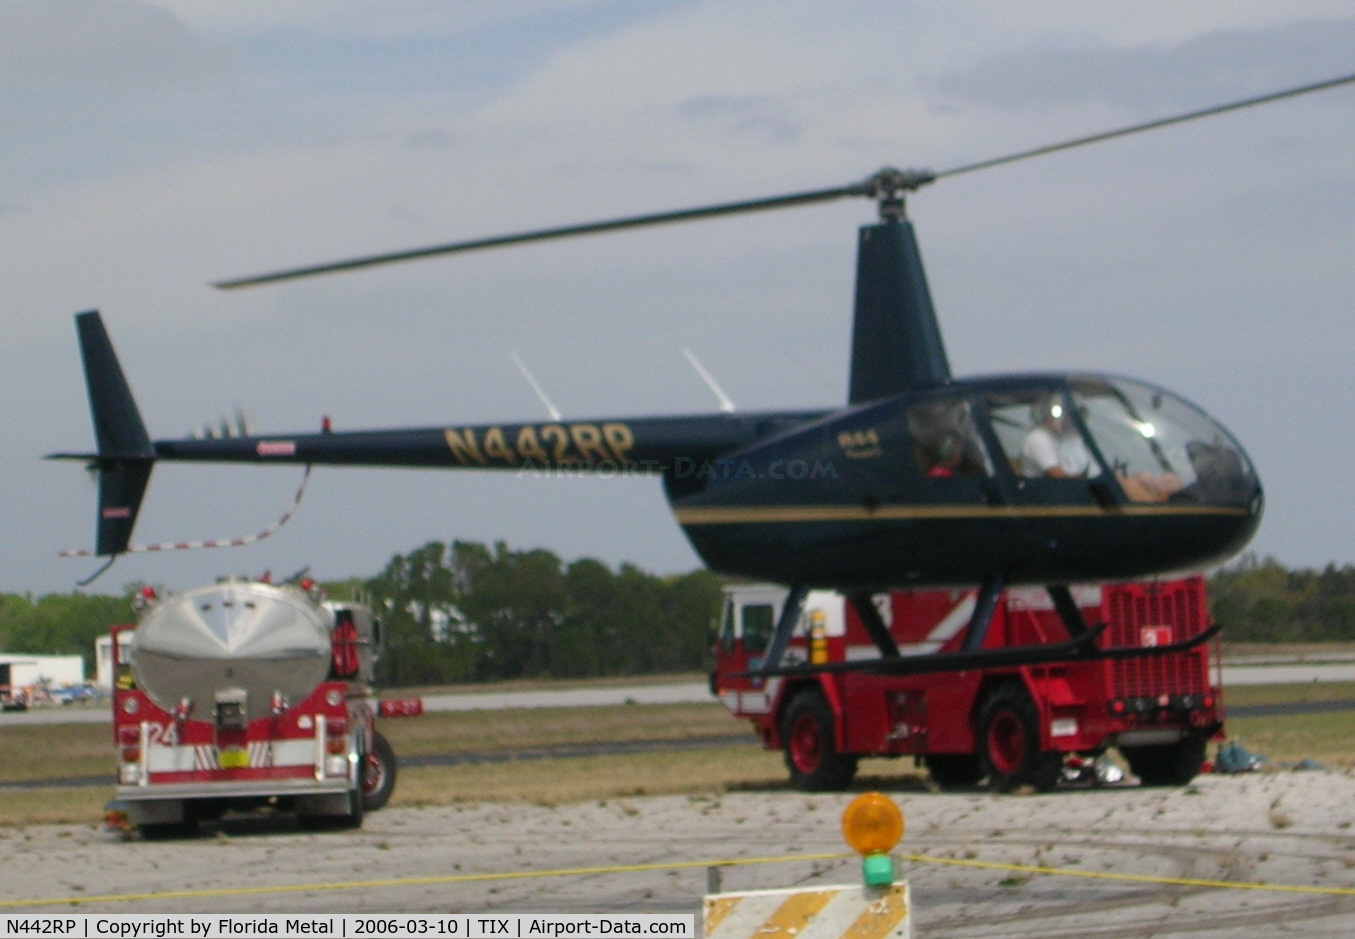 Aircraft N442RP 2002 Robinson R44 CN 1277 Photo By Florida Metal Photo ID